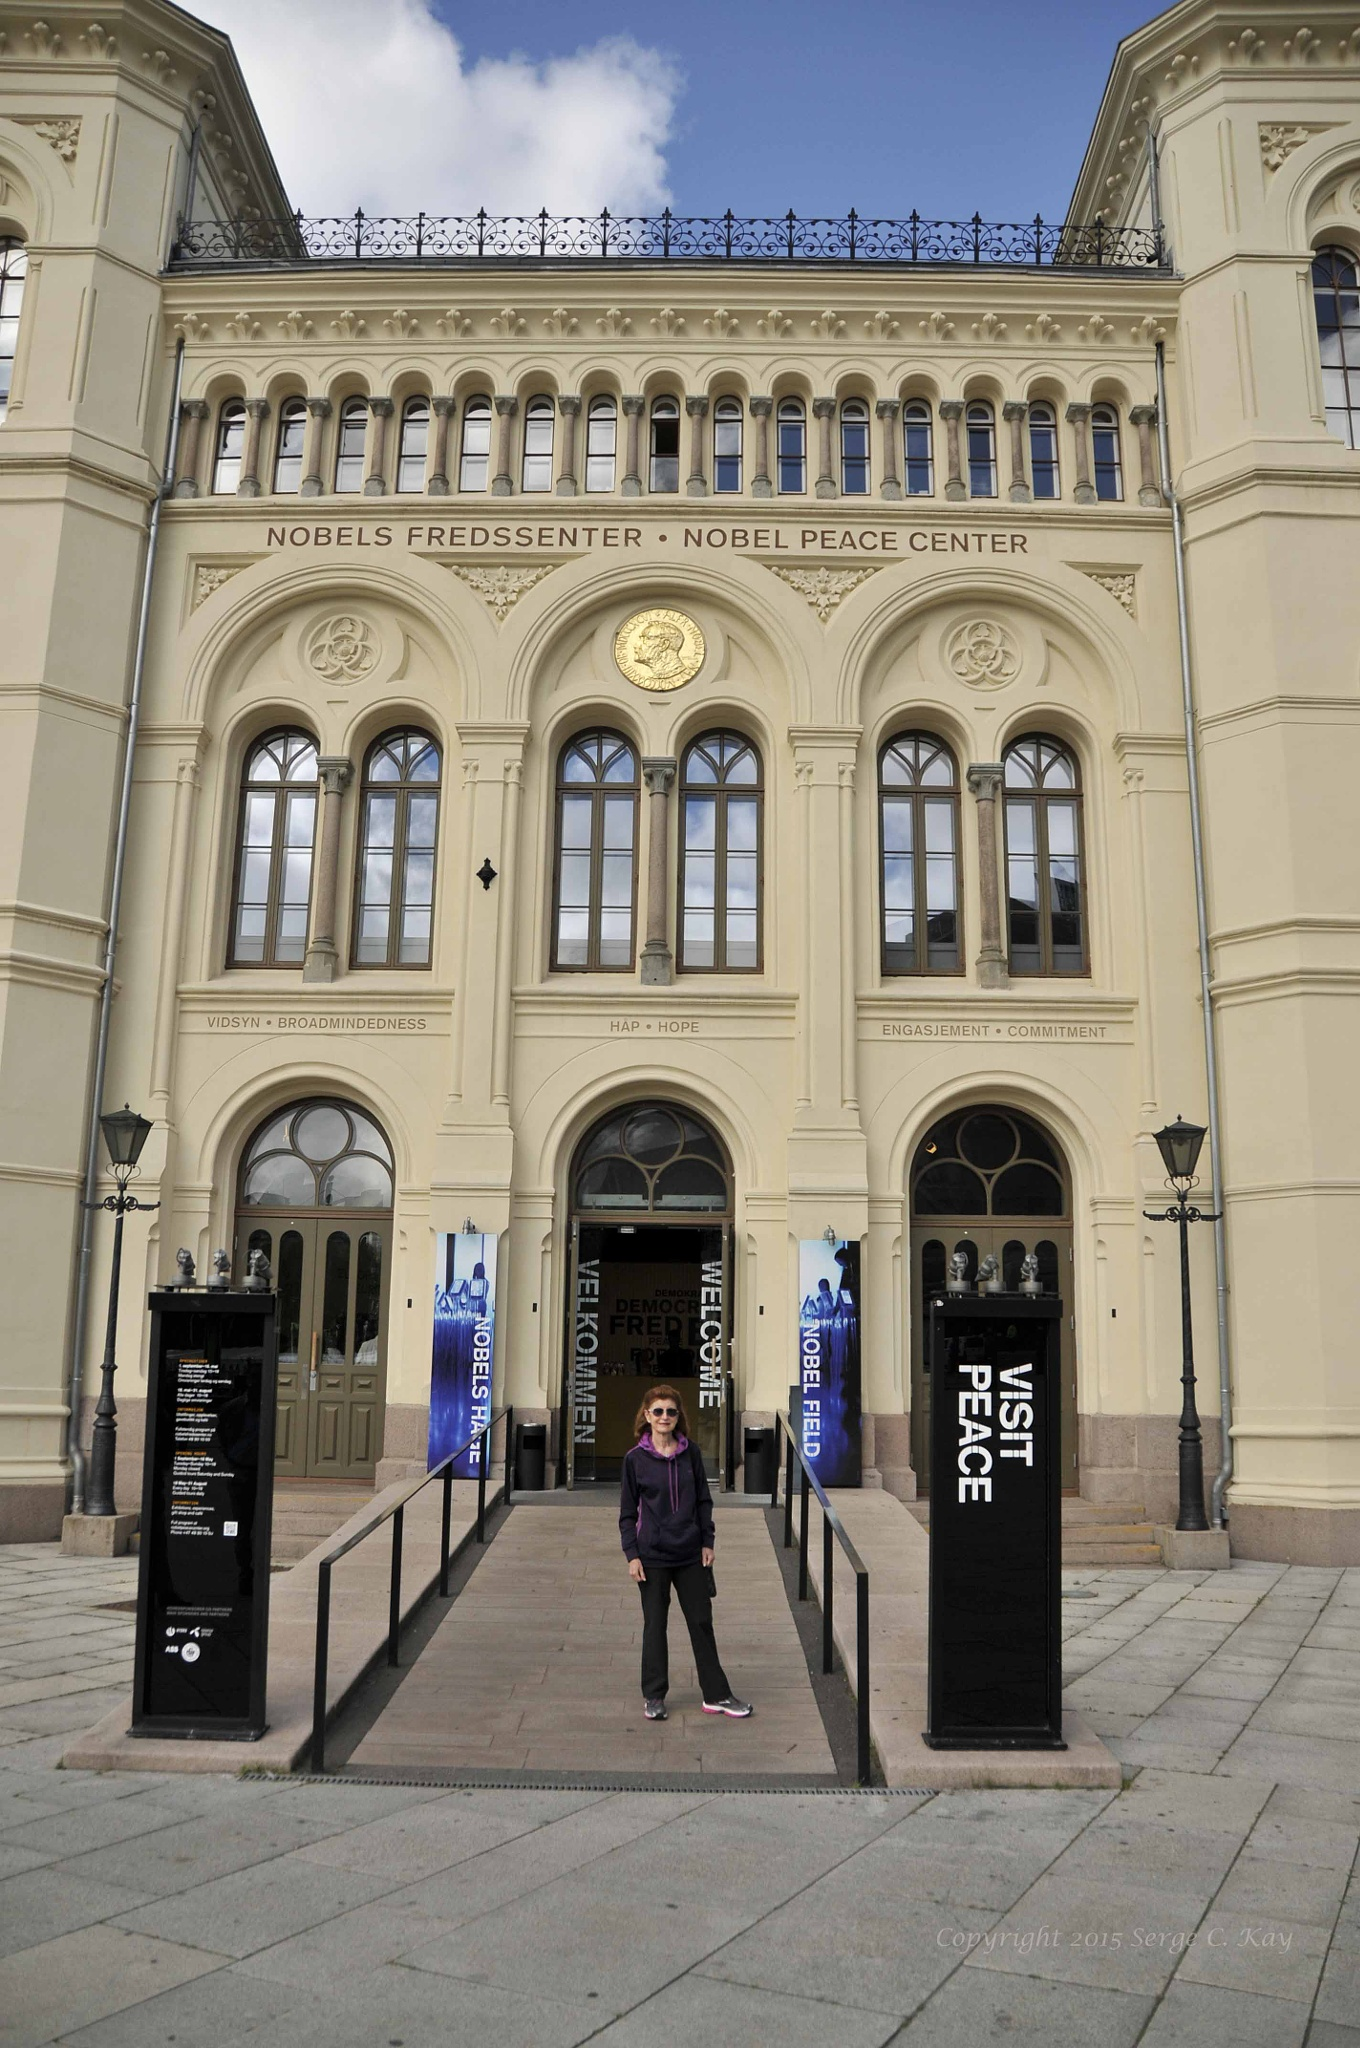 Nobel Peace Center by Serge Kay